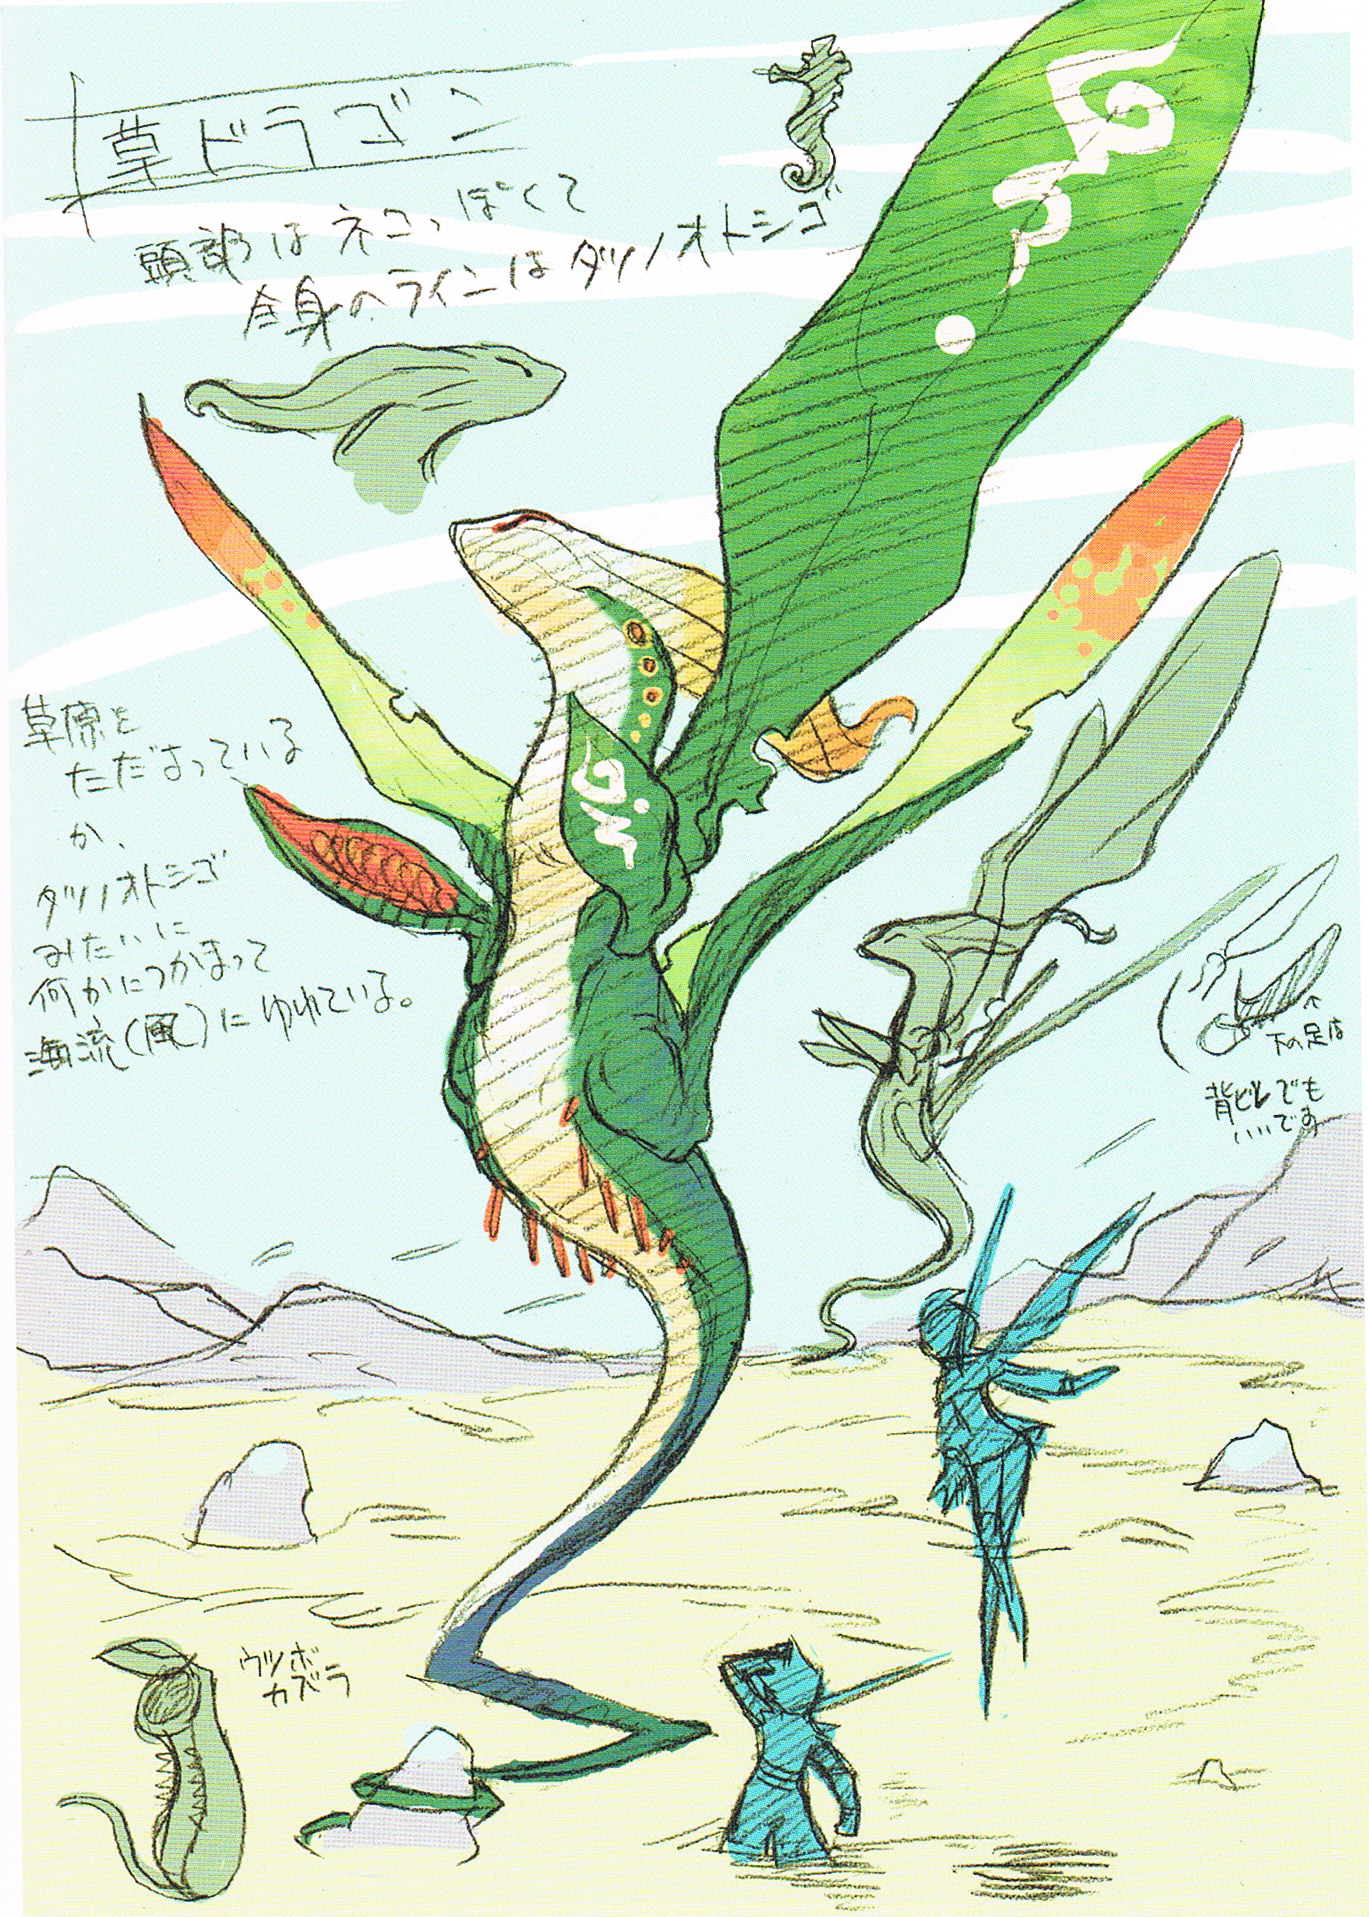 How to breed heraldic dragon - How To Breed Heraldic Dragon 39